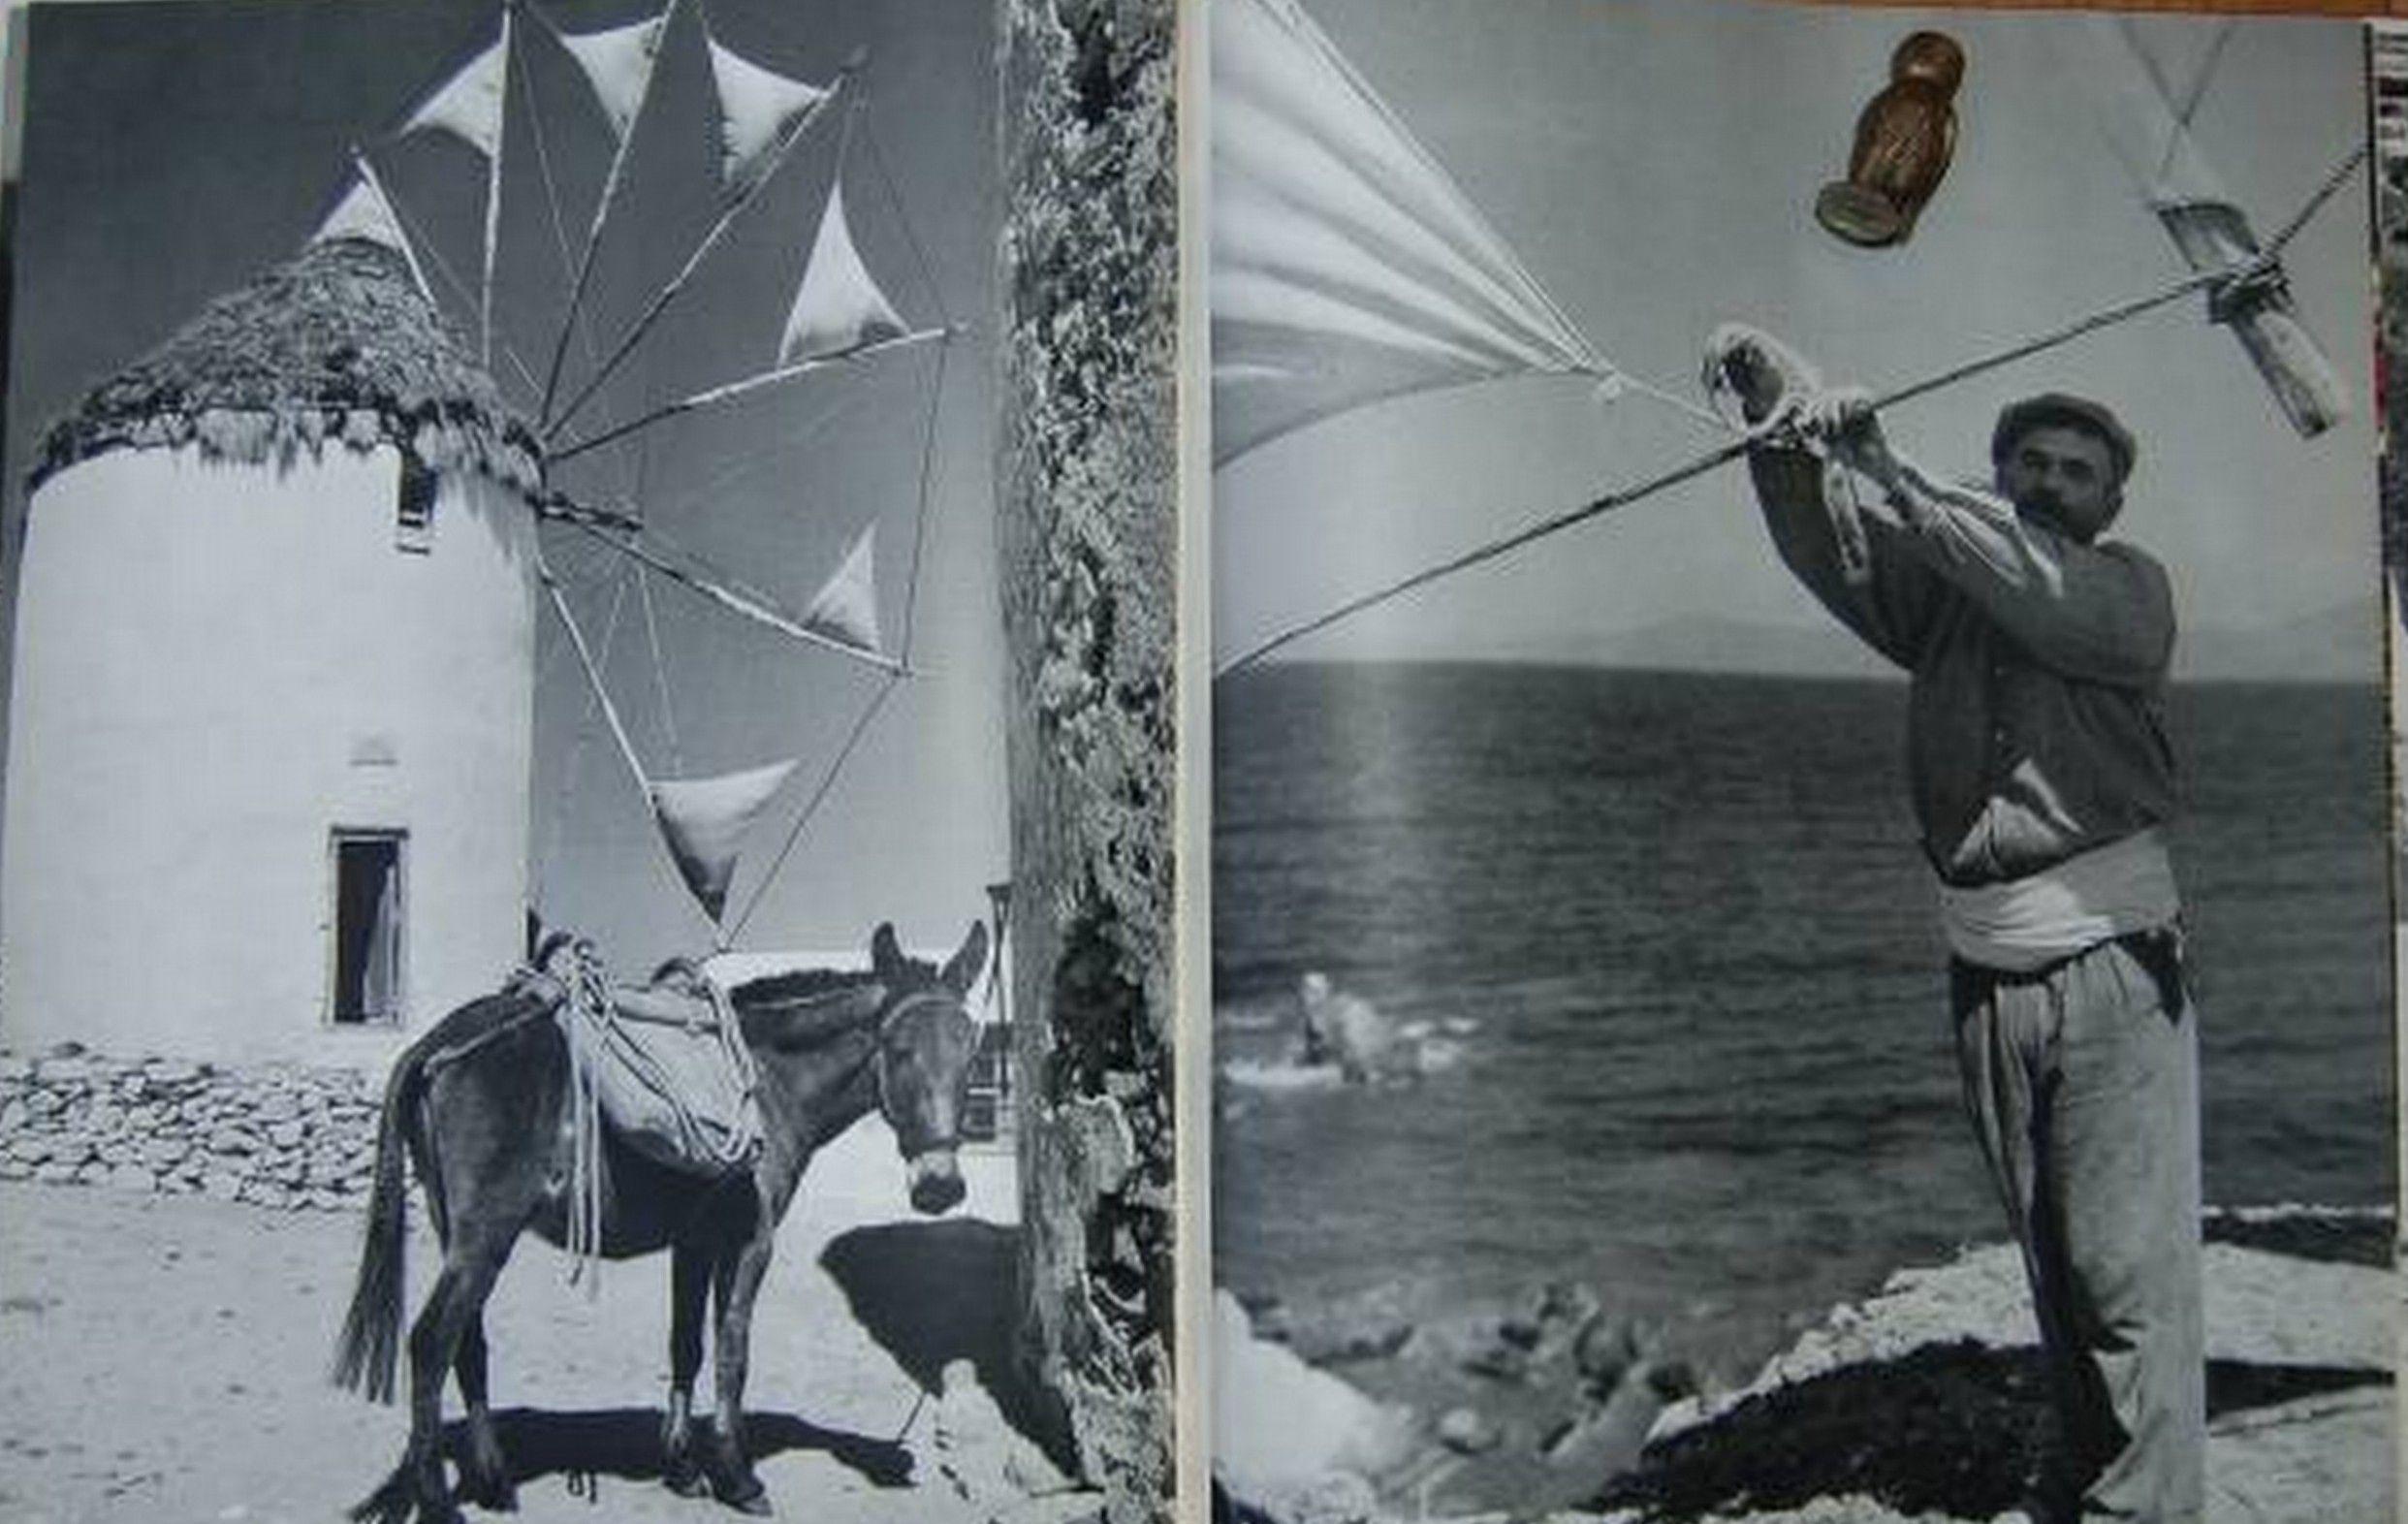 Mύκονος 10ετία 60.Ο Μυλωνάς και ο Μύλος του. | Artwork, Art, Fictional characters